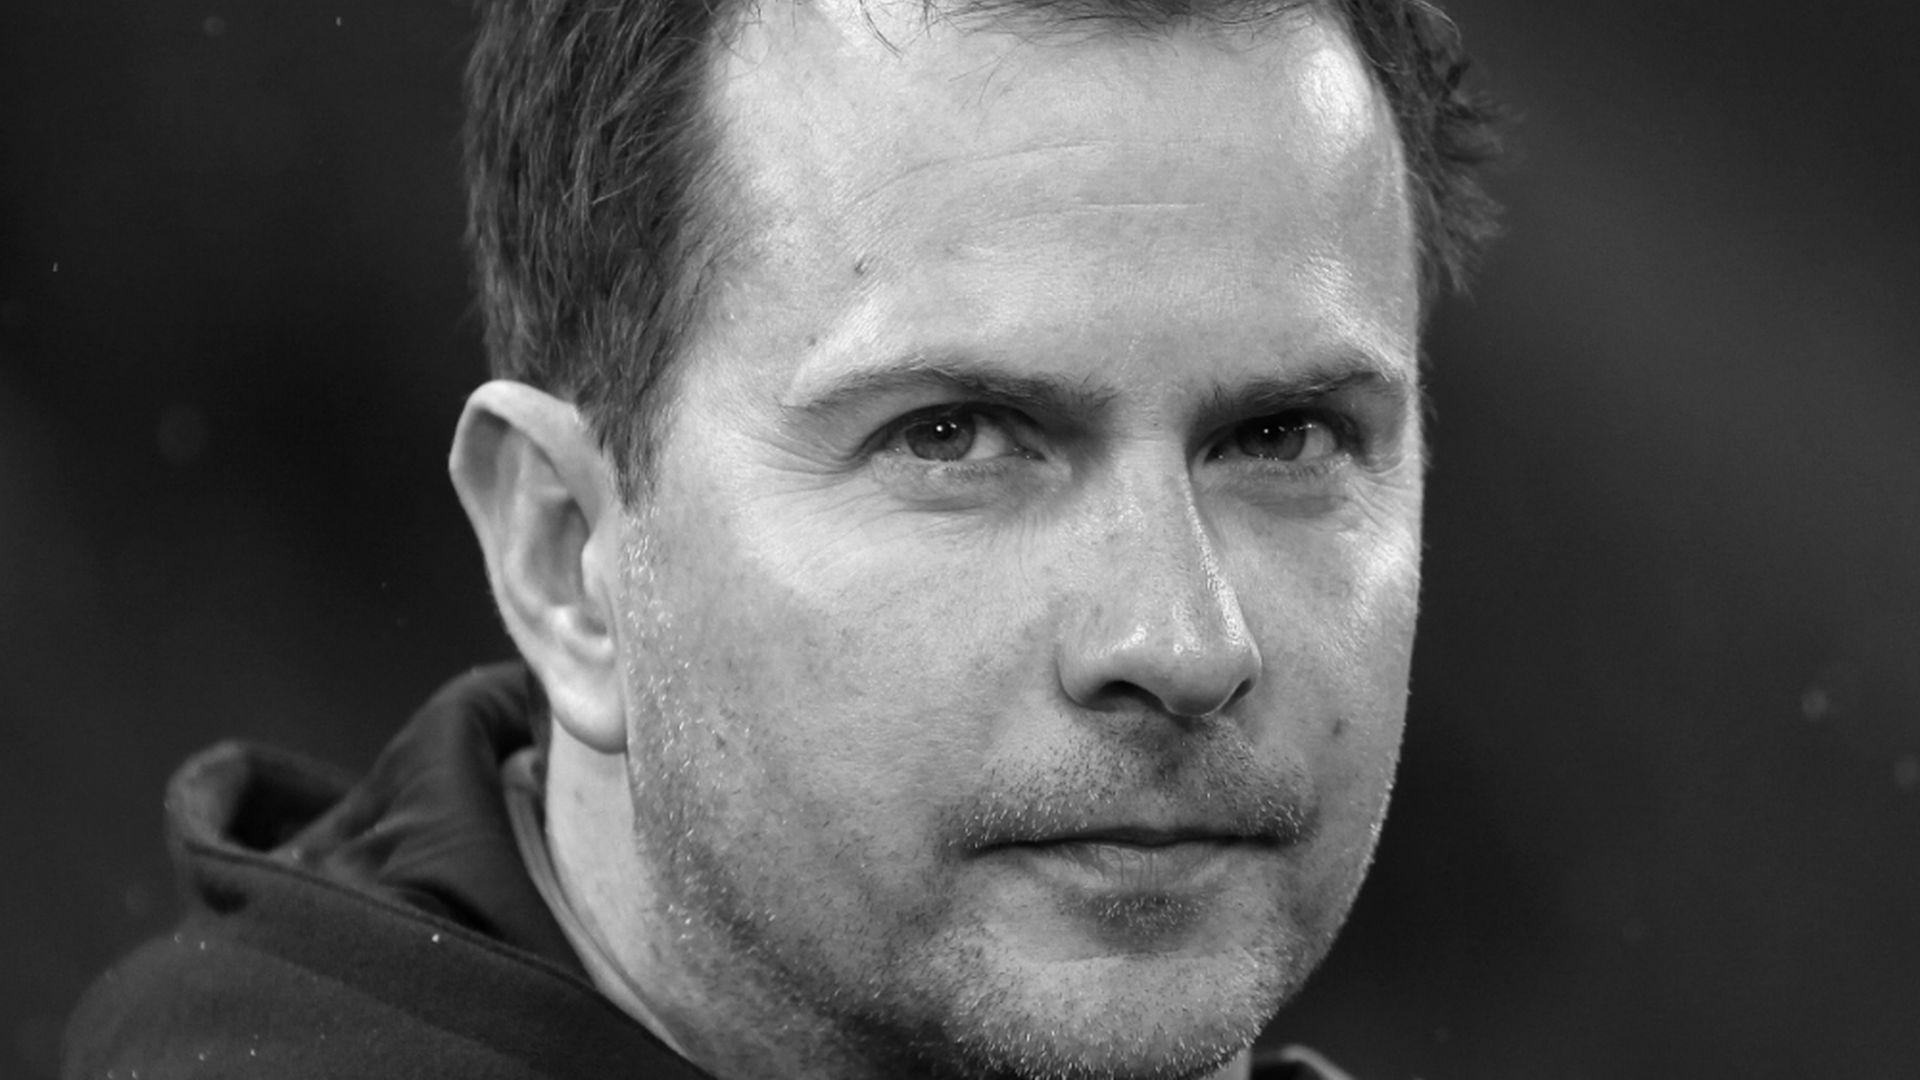 Sascha Lewandowski Suizid